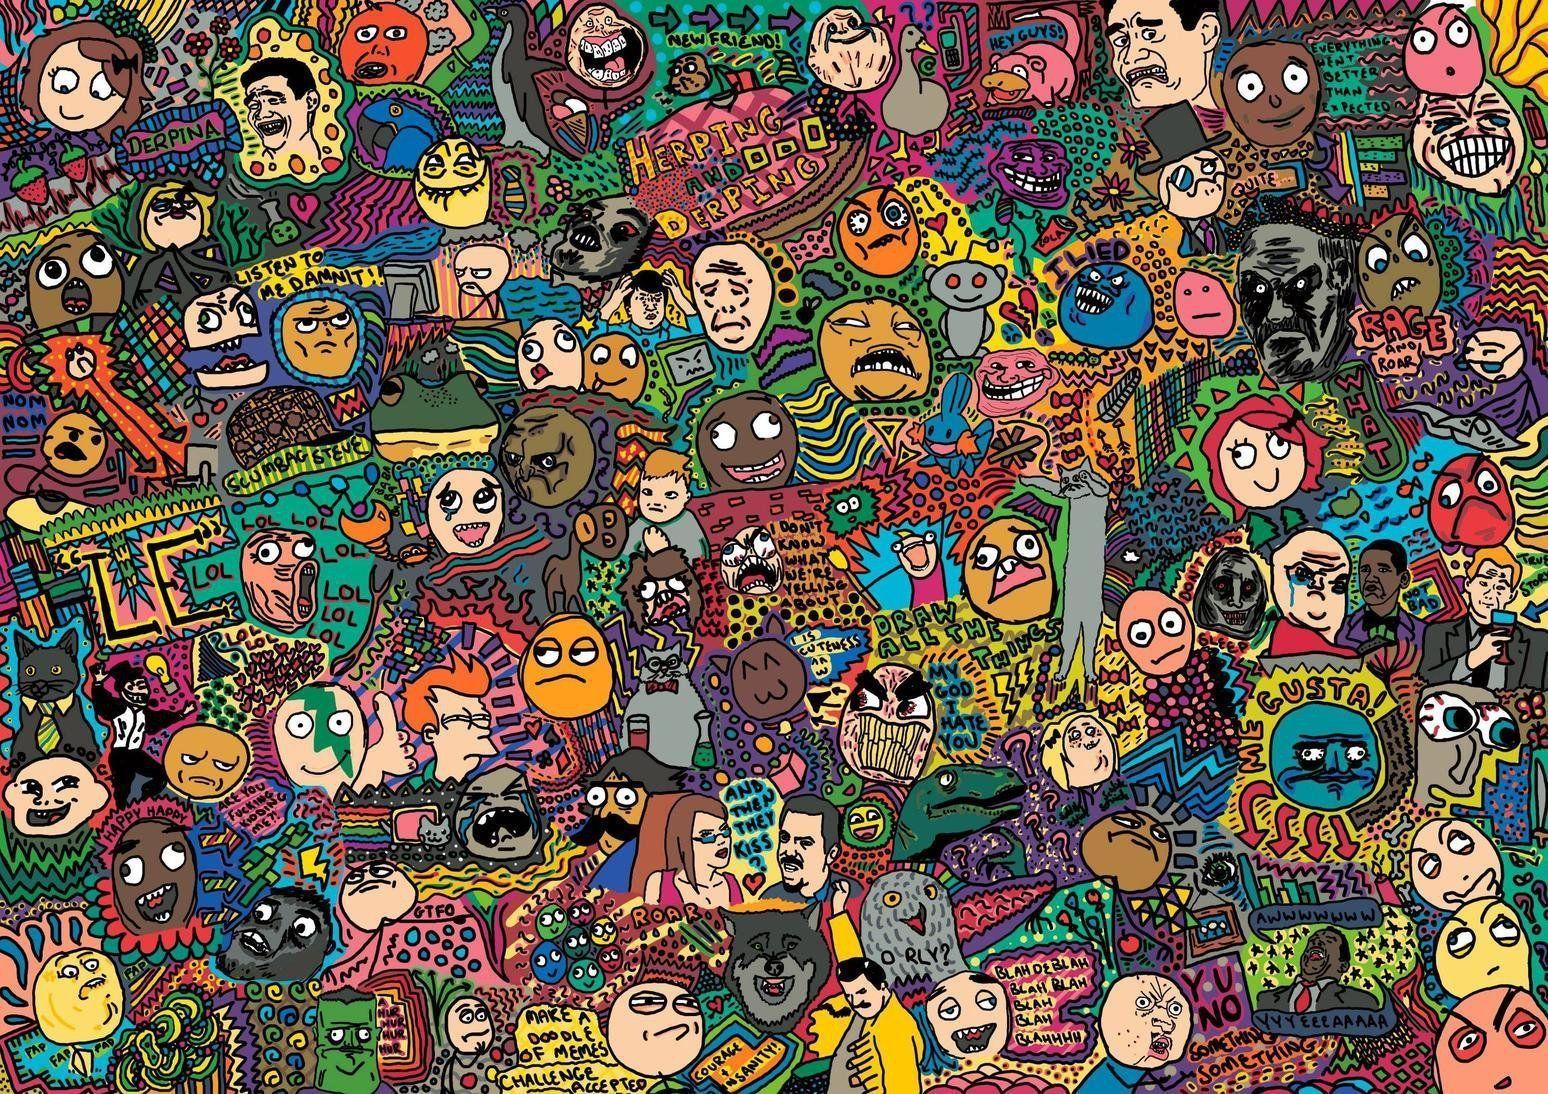 Meme Wallpaper 2020 Desktop Funny p Funny wallpapers Funny 1548x1094